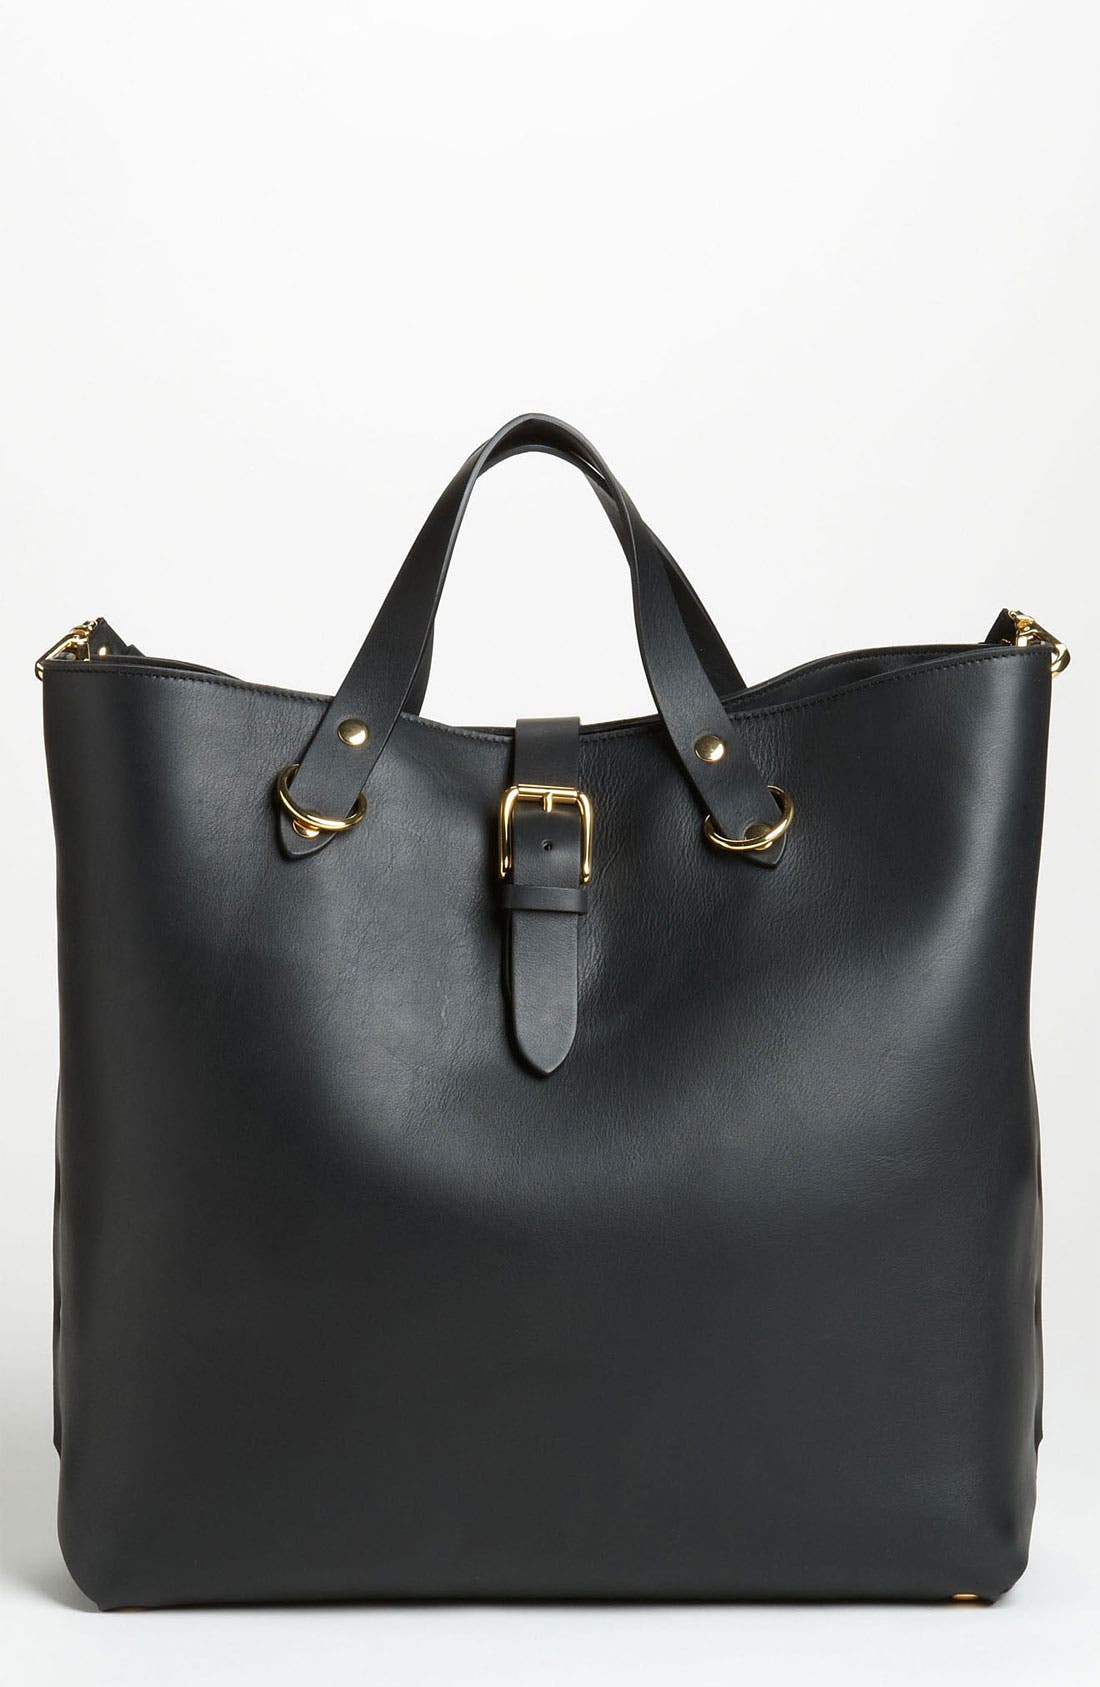 Main Image - Marni 'Large' Studded Leather Tote